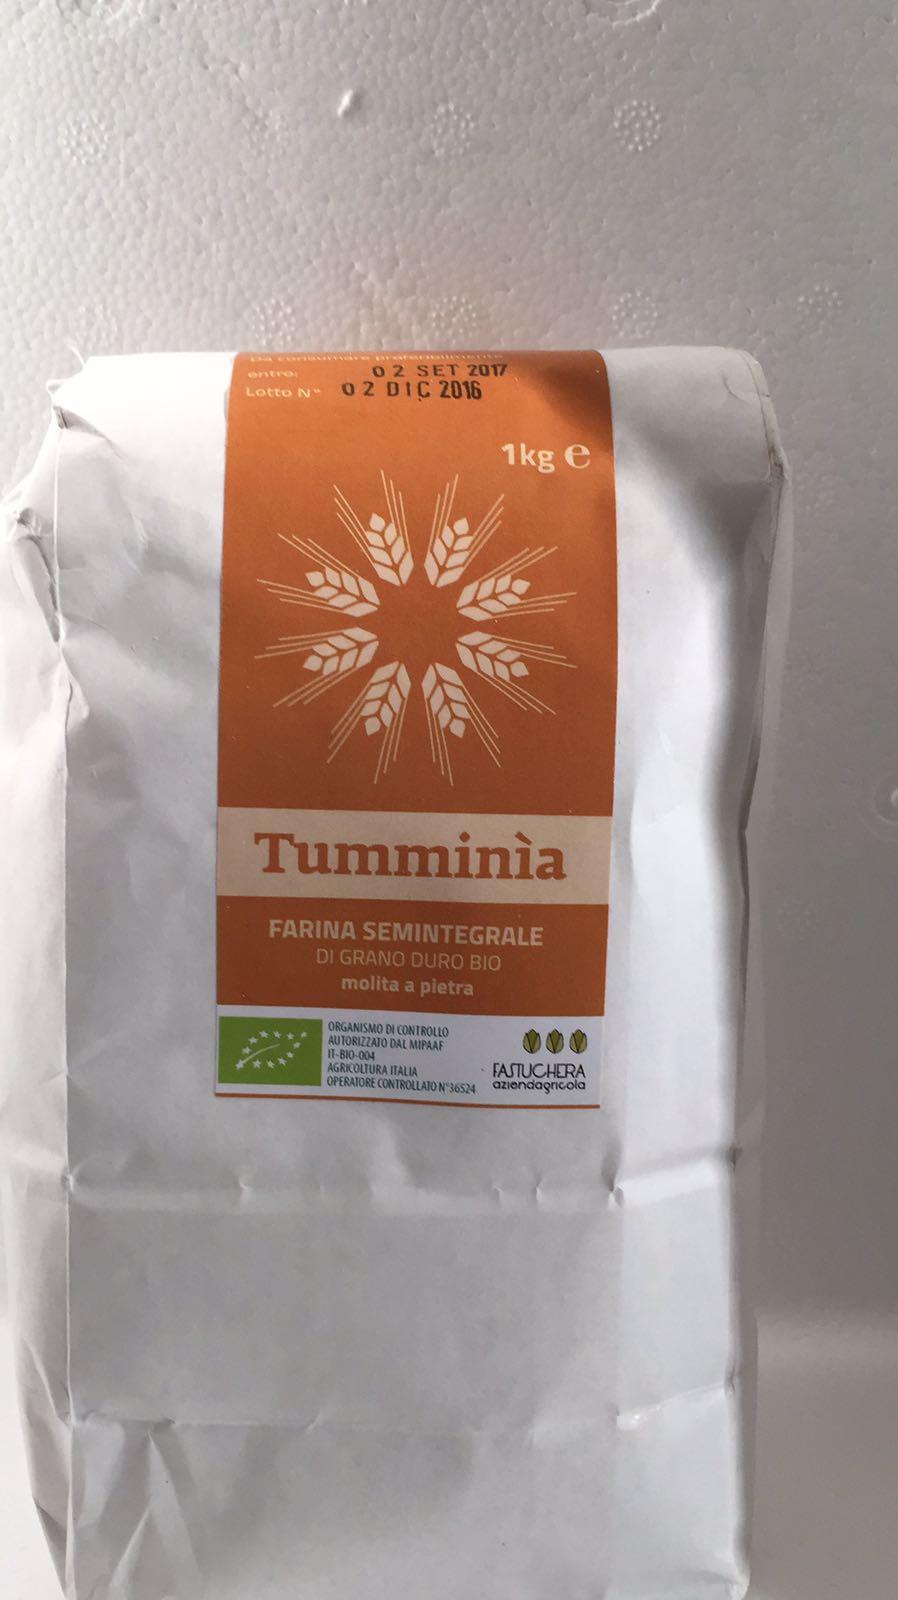 Tumminia Harina Biológico Semi Molita en Pietra -. Az Agricola Fastuchera